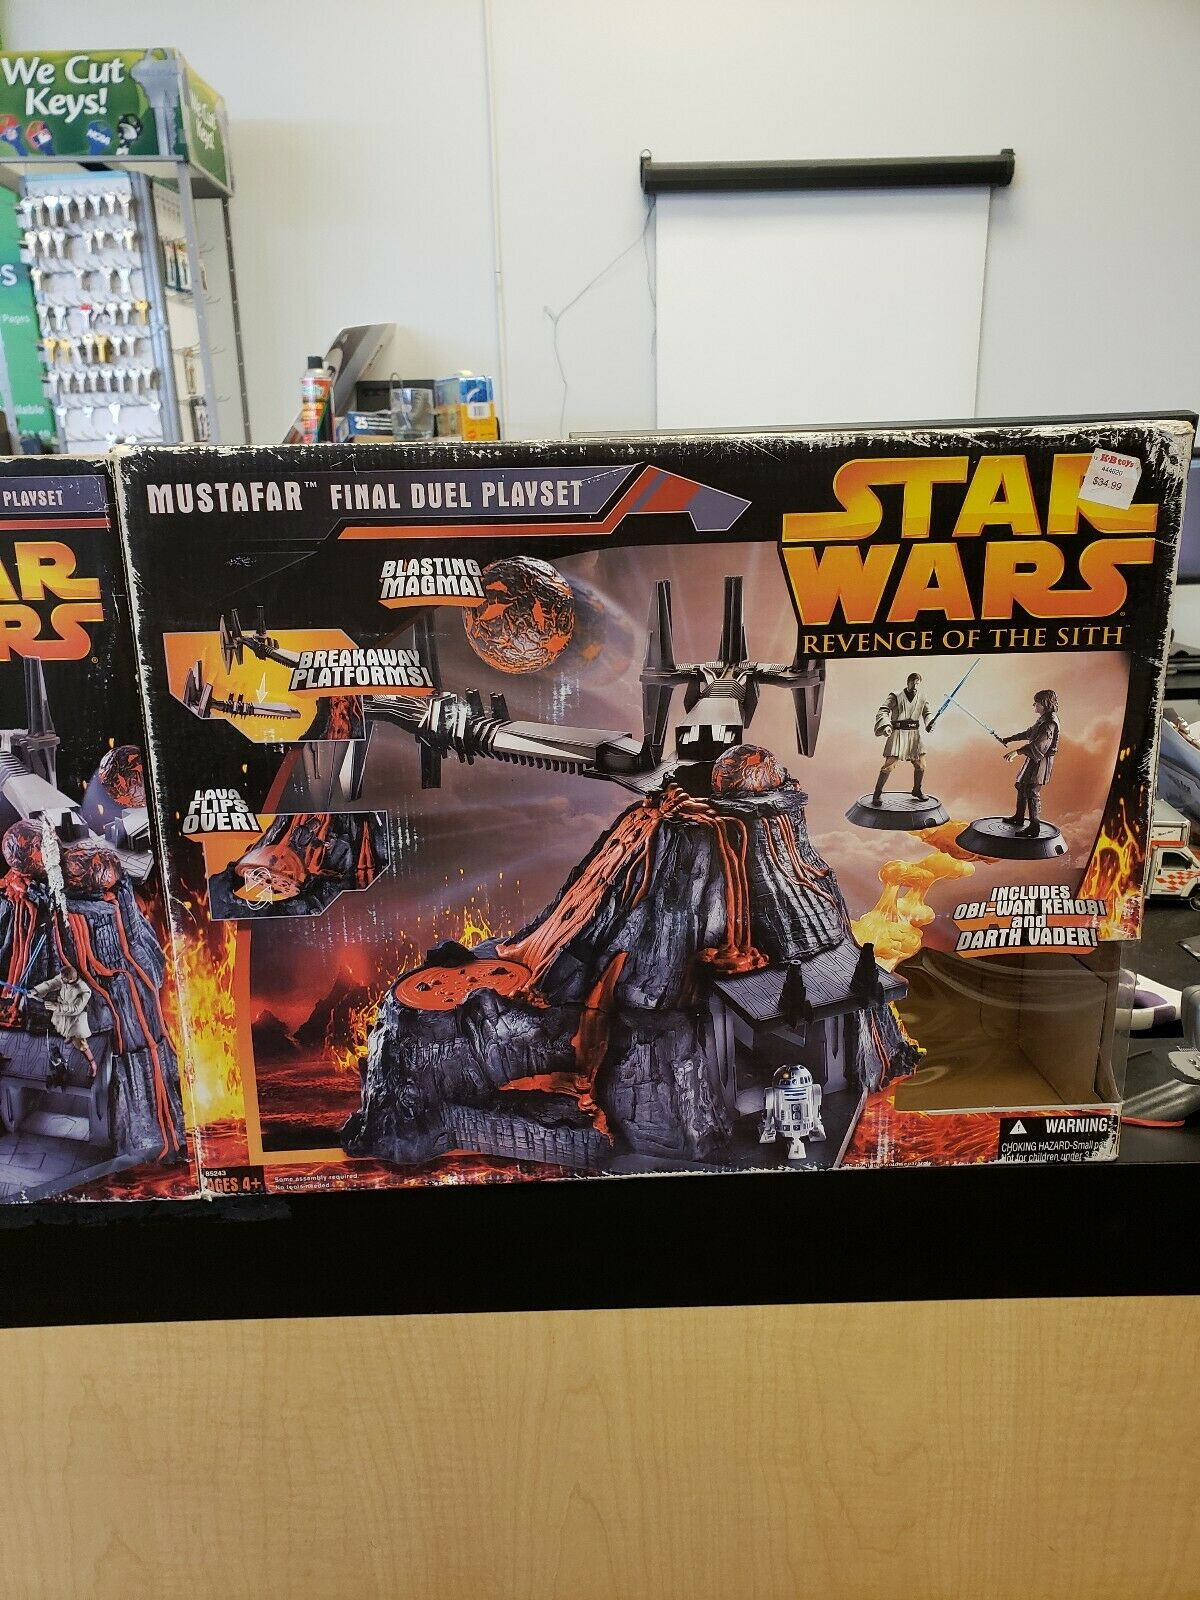 2005 Hasbro Star Wars Revenge of the Sith Mustafar Final Duel Playset Inutilisé